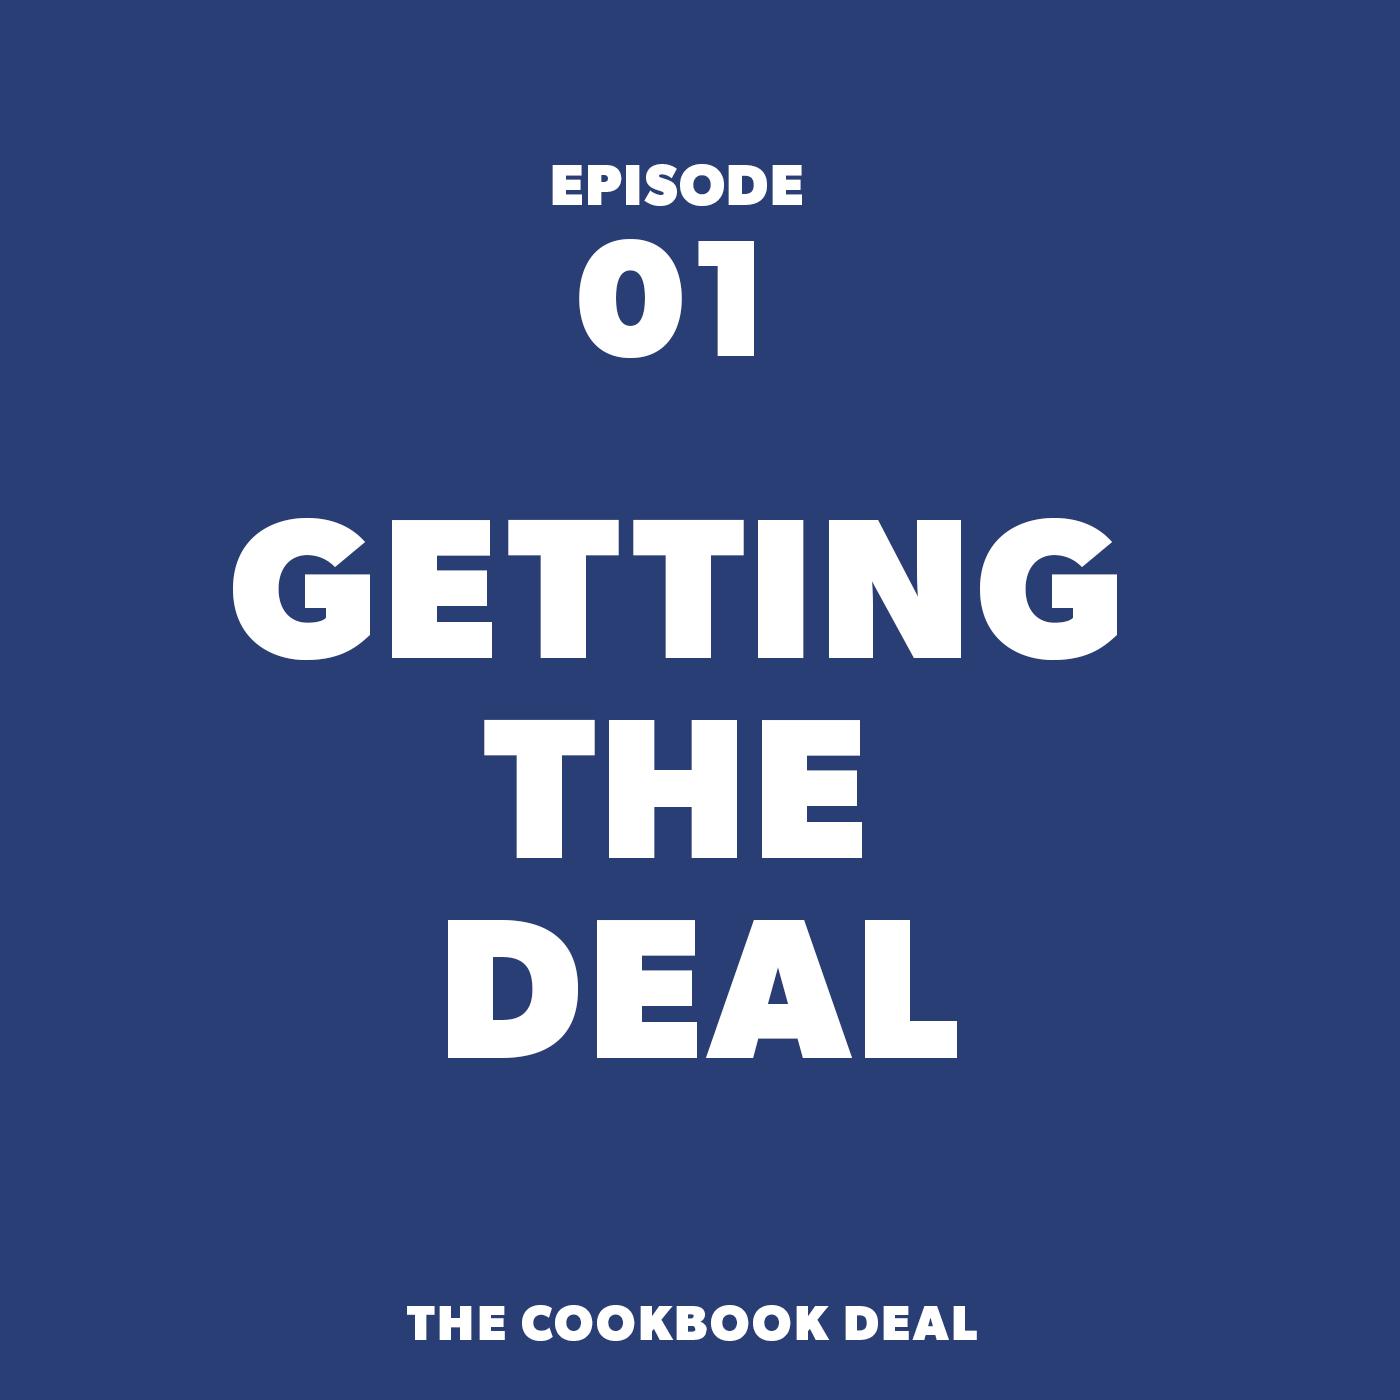 Cookbook-Deal-Pod-01-Getting-Deal.png